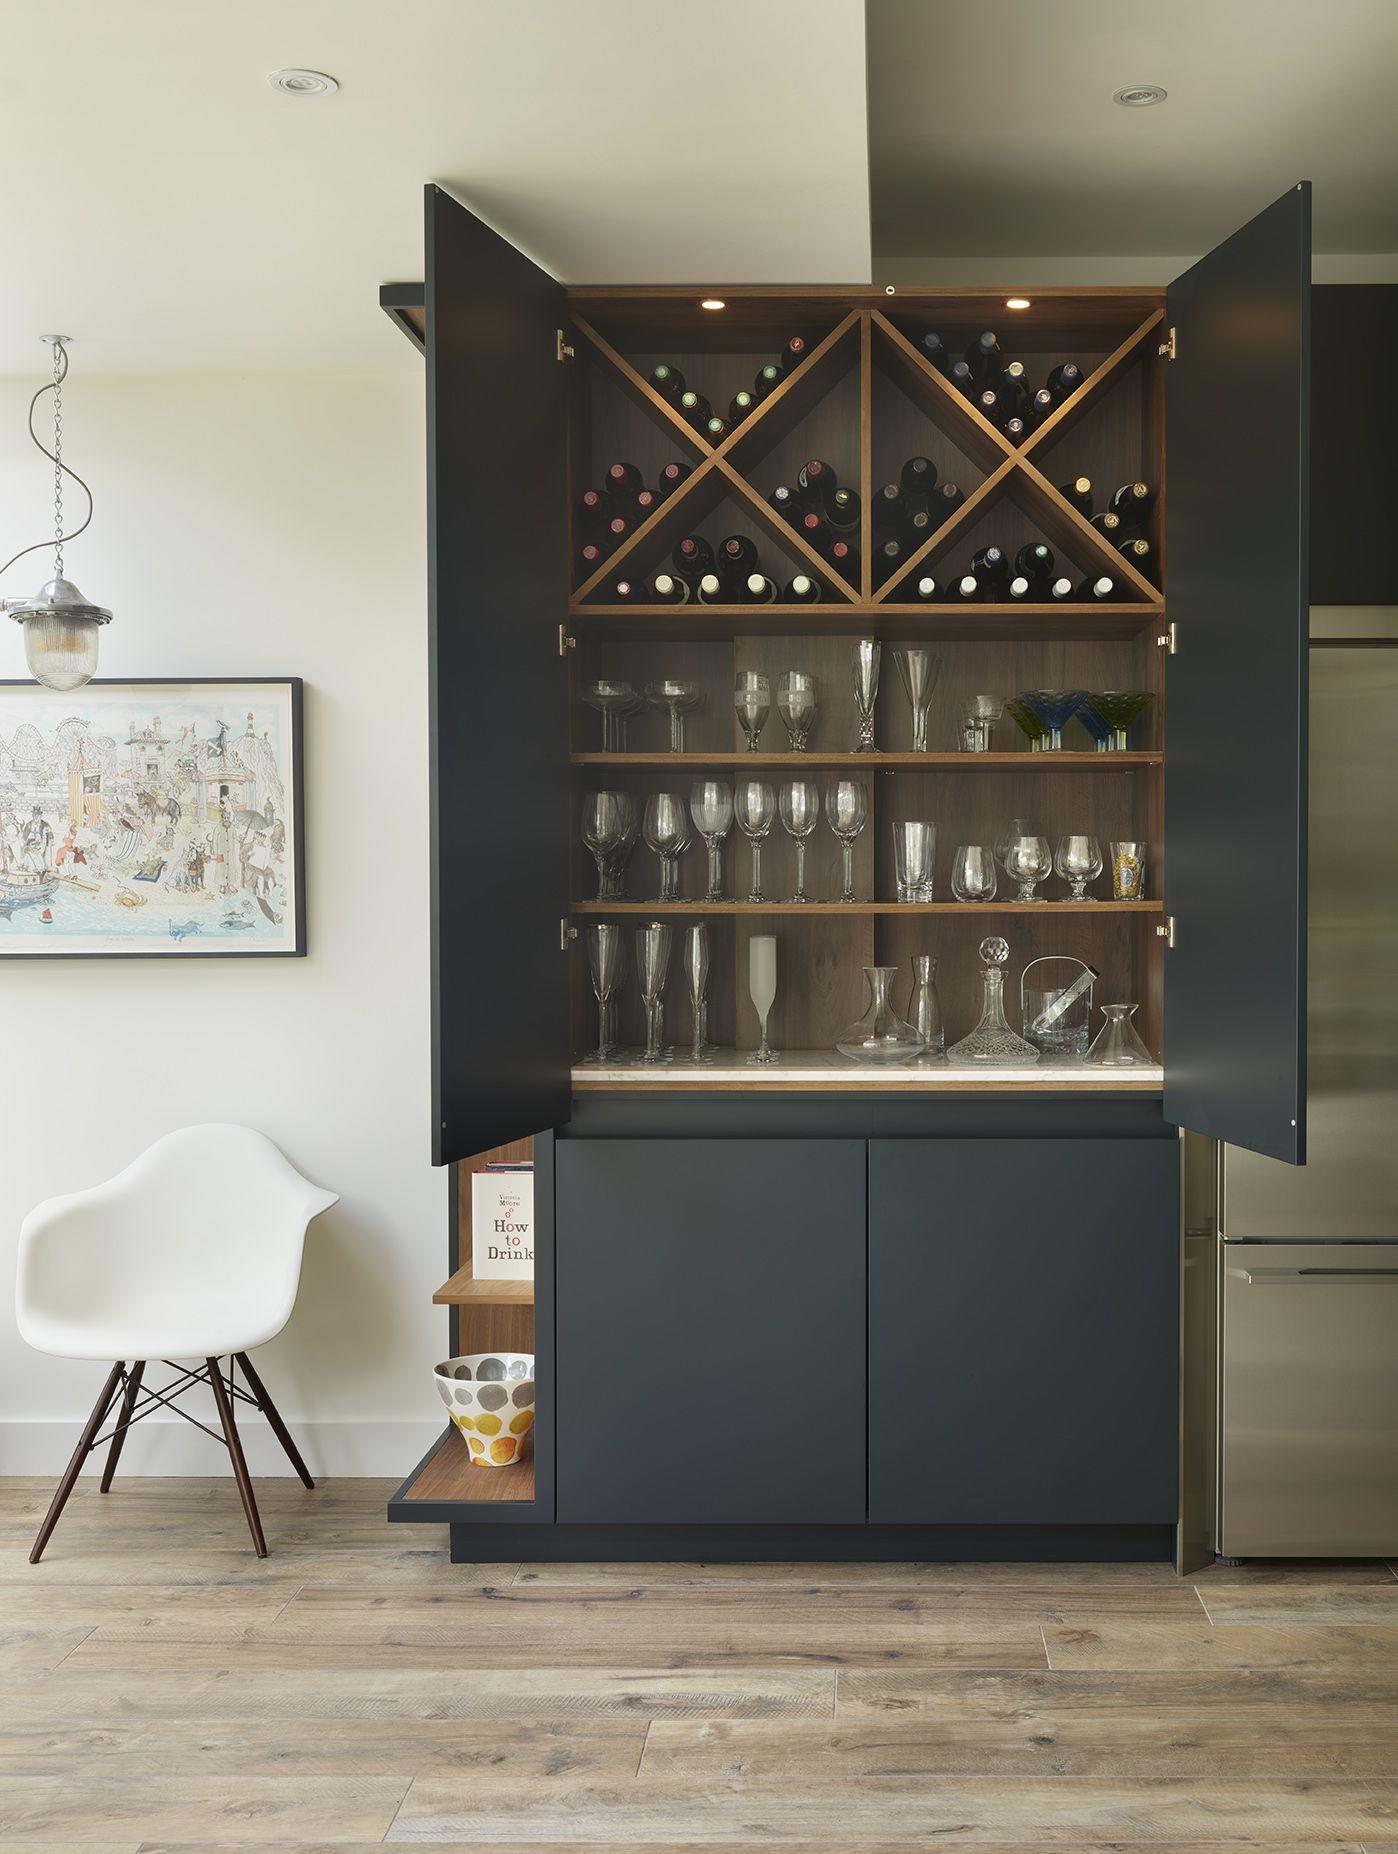 Roundhouse Urbo Matt Lacquer Bespoke Drinks Cabinet (Bottle Storage)